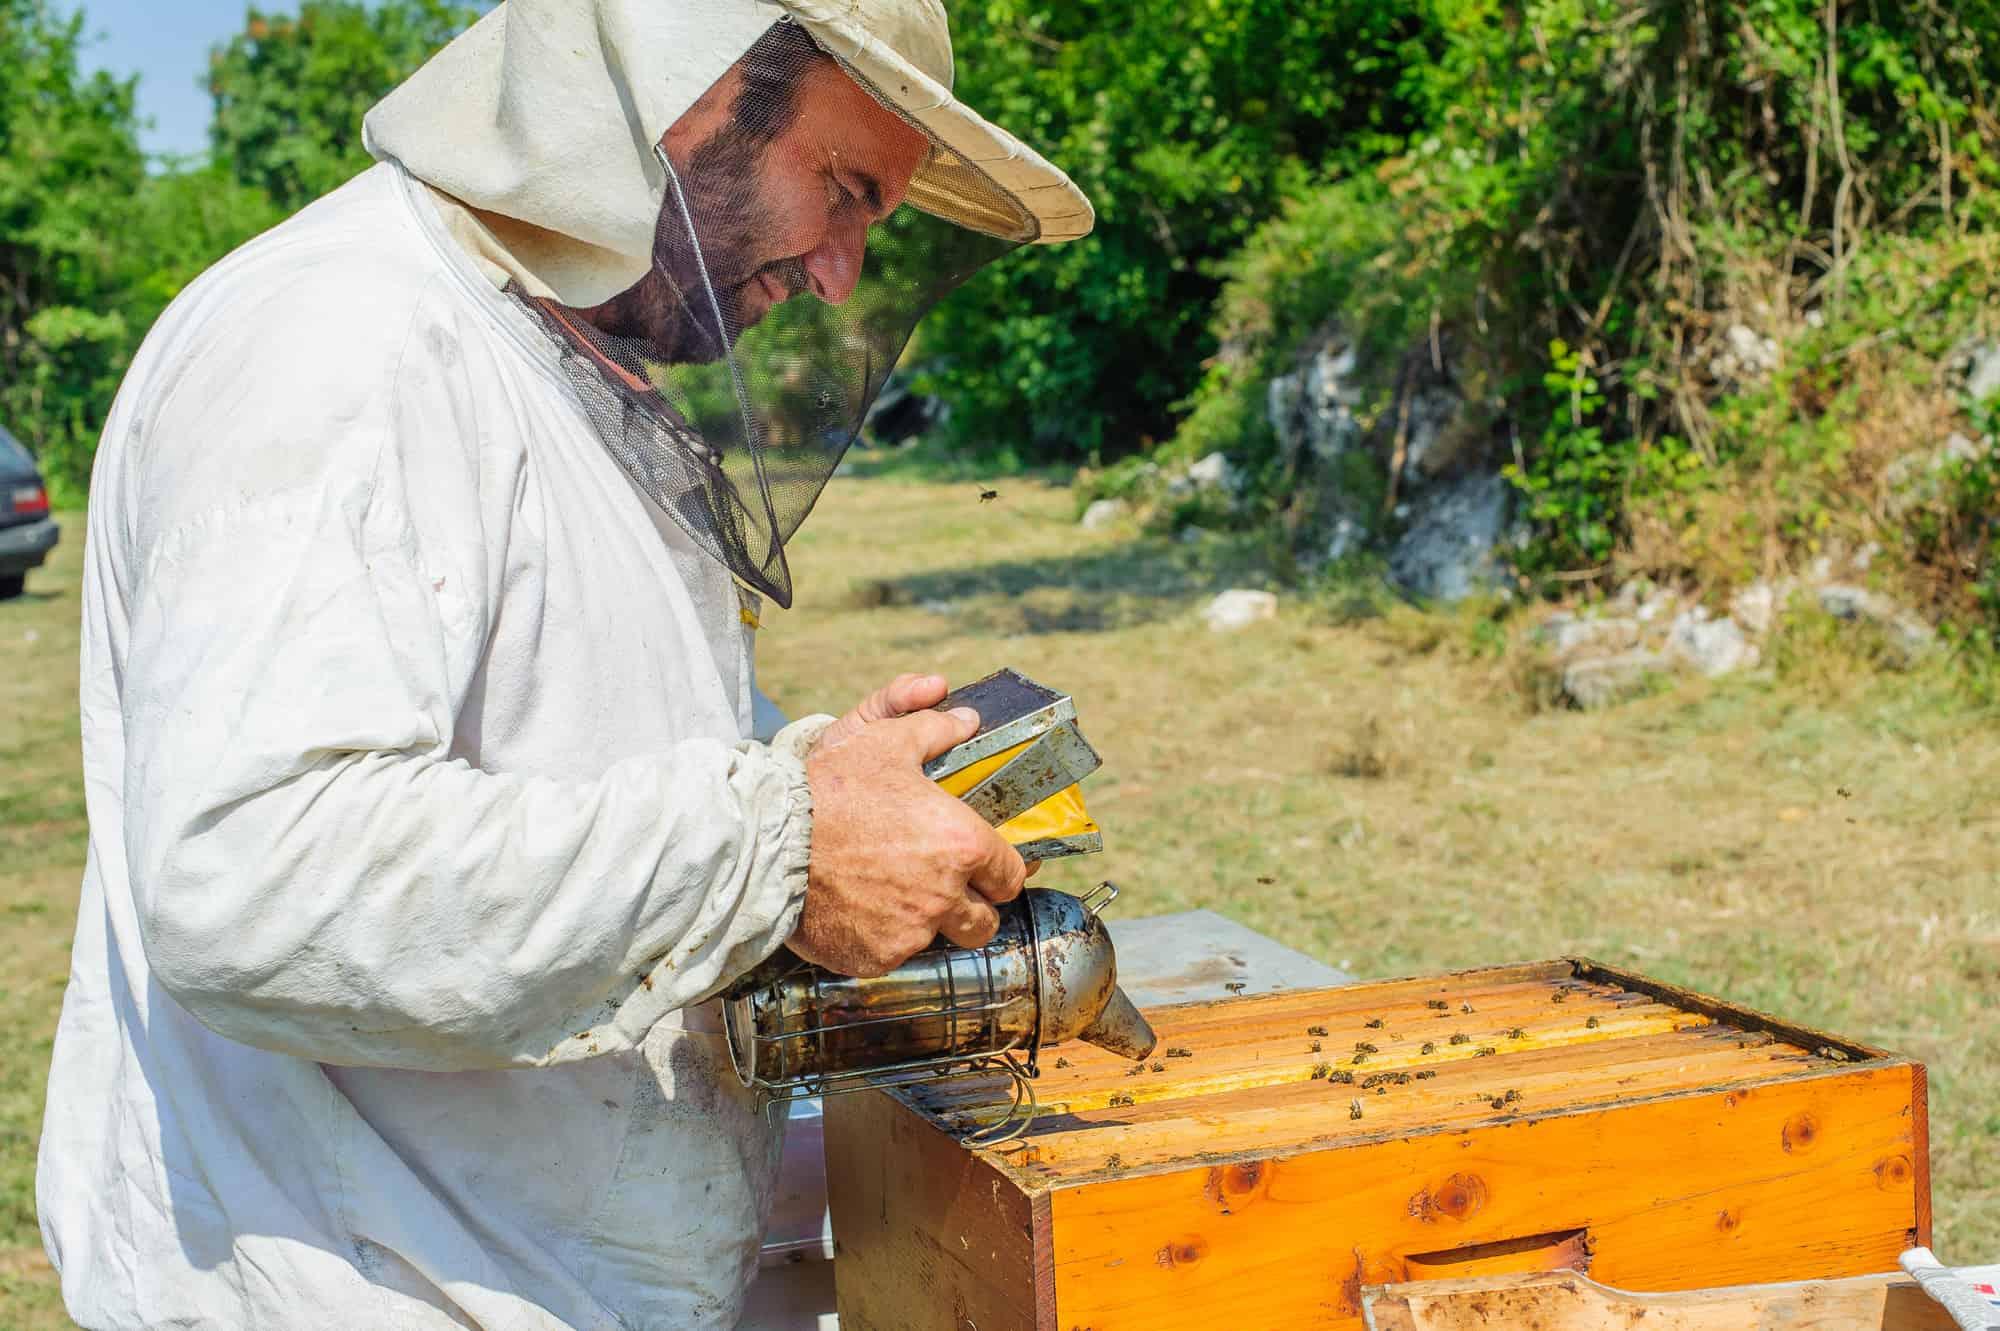 Beekeeper inspecting hive